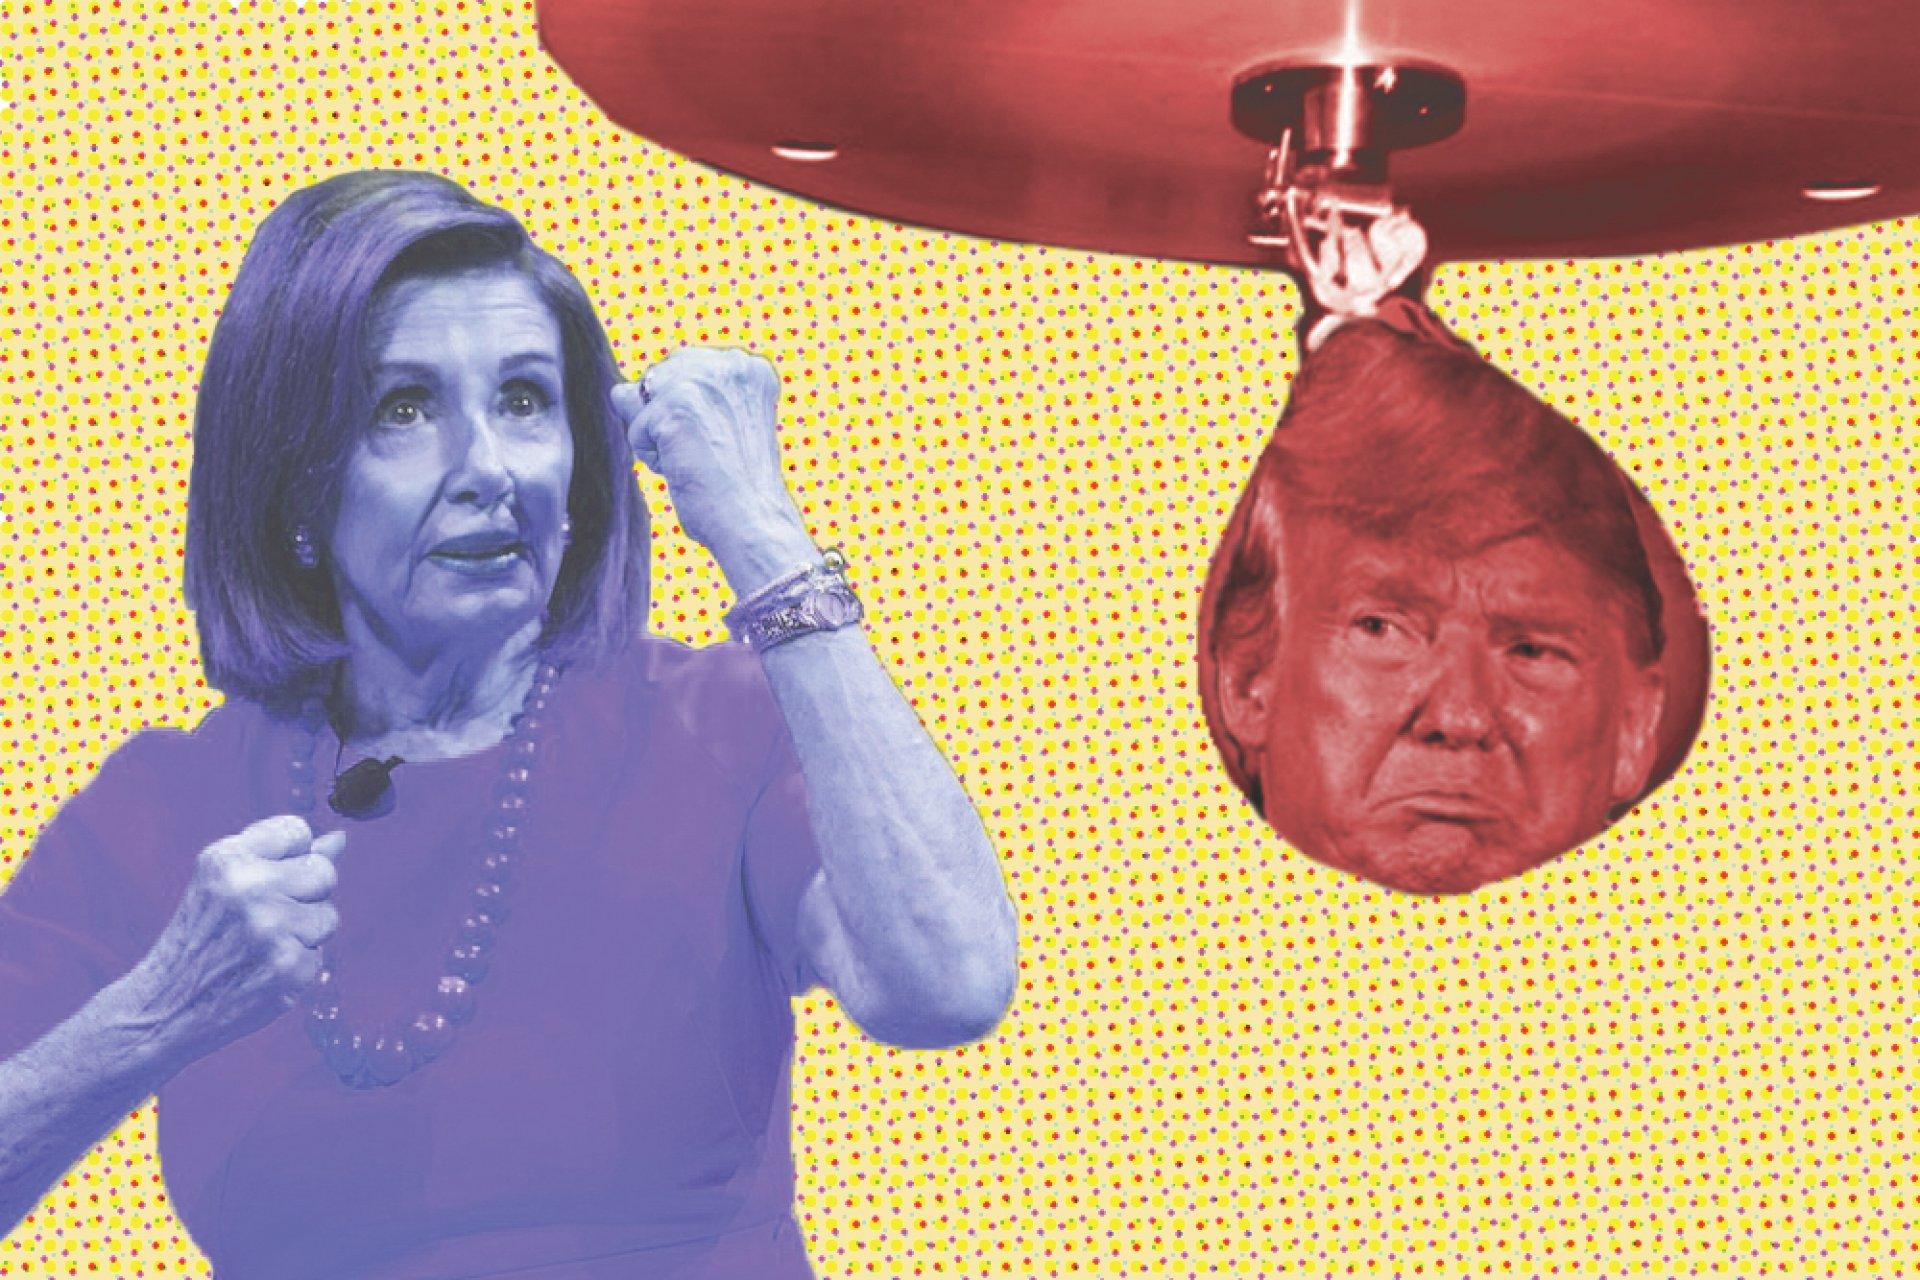 Nancy fightin' Donald. | Photo Illustration by Megan Bender